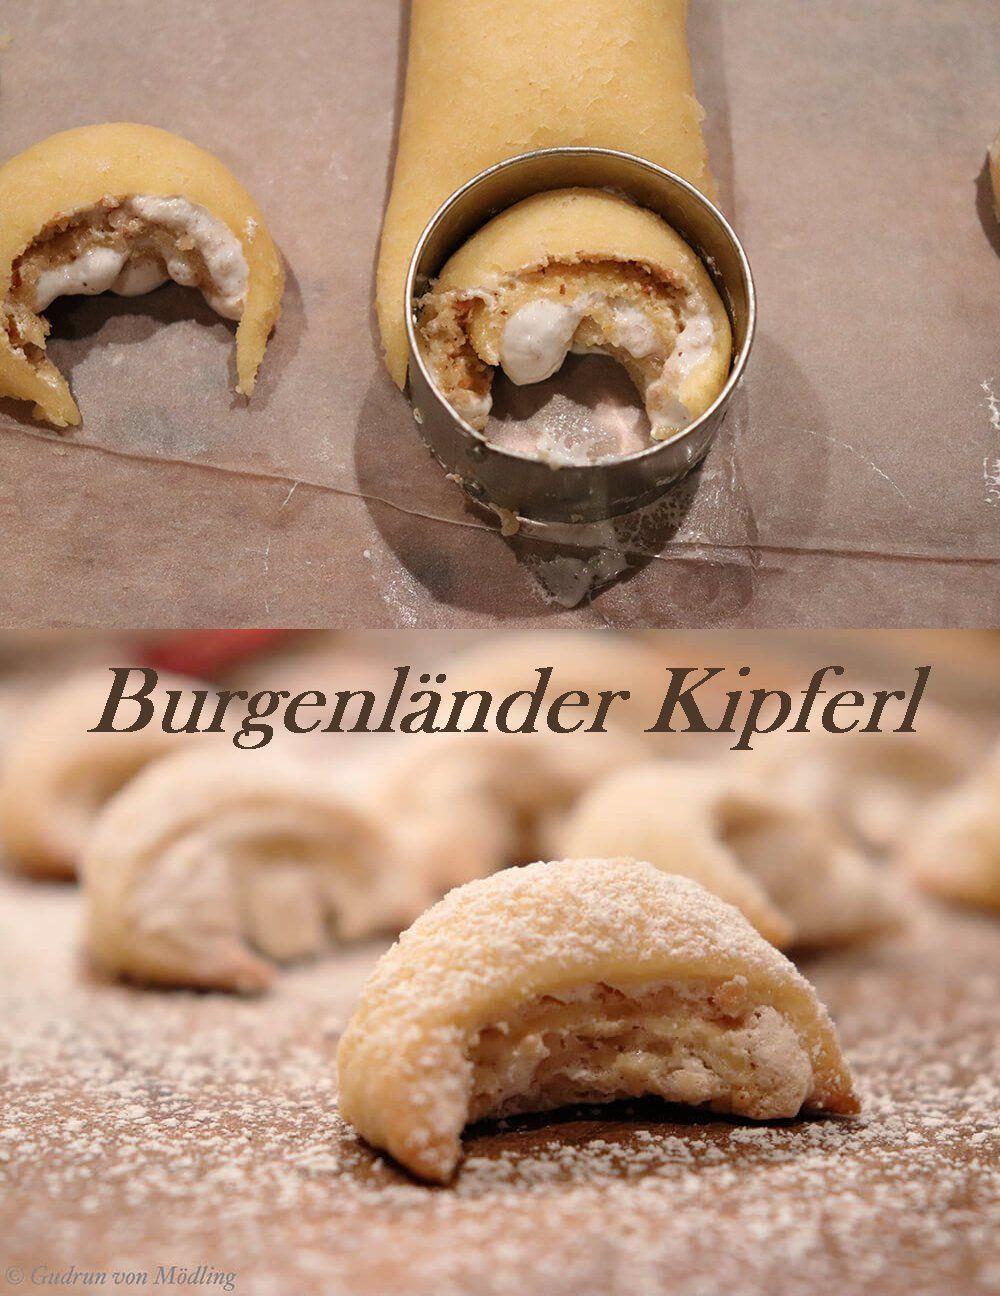 Burgenlander Kipferl Gudrun Von Modling Platzchen Backen Rezepte Rezept Kekse Platzchen Backen